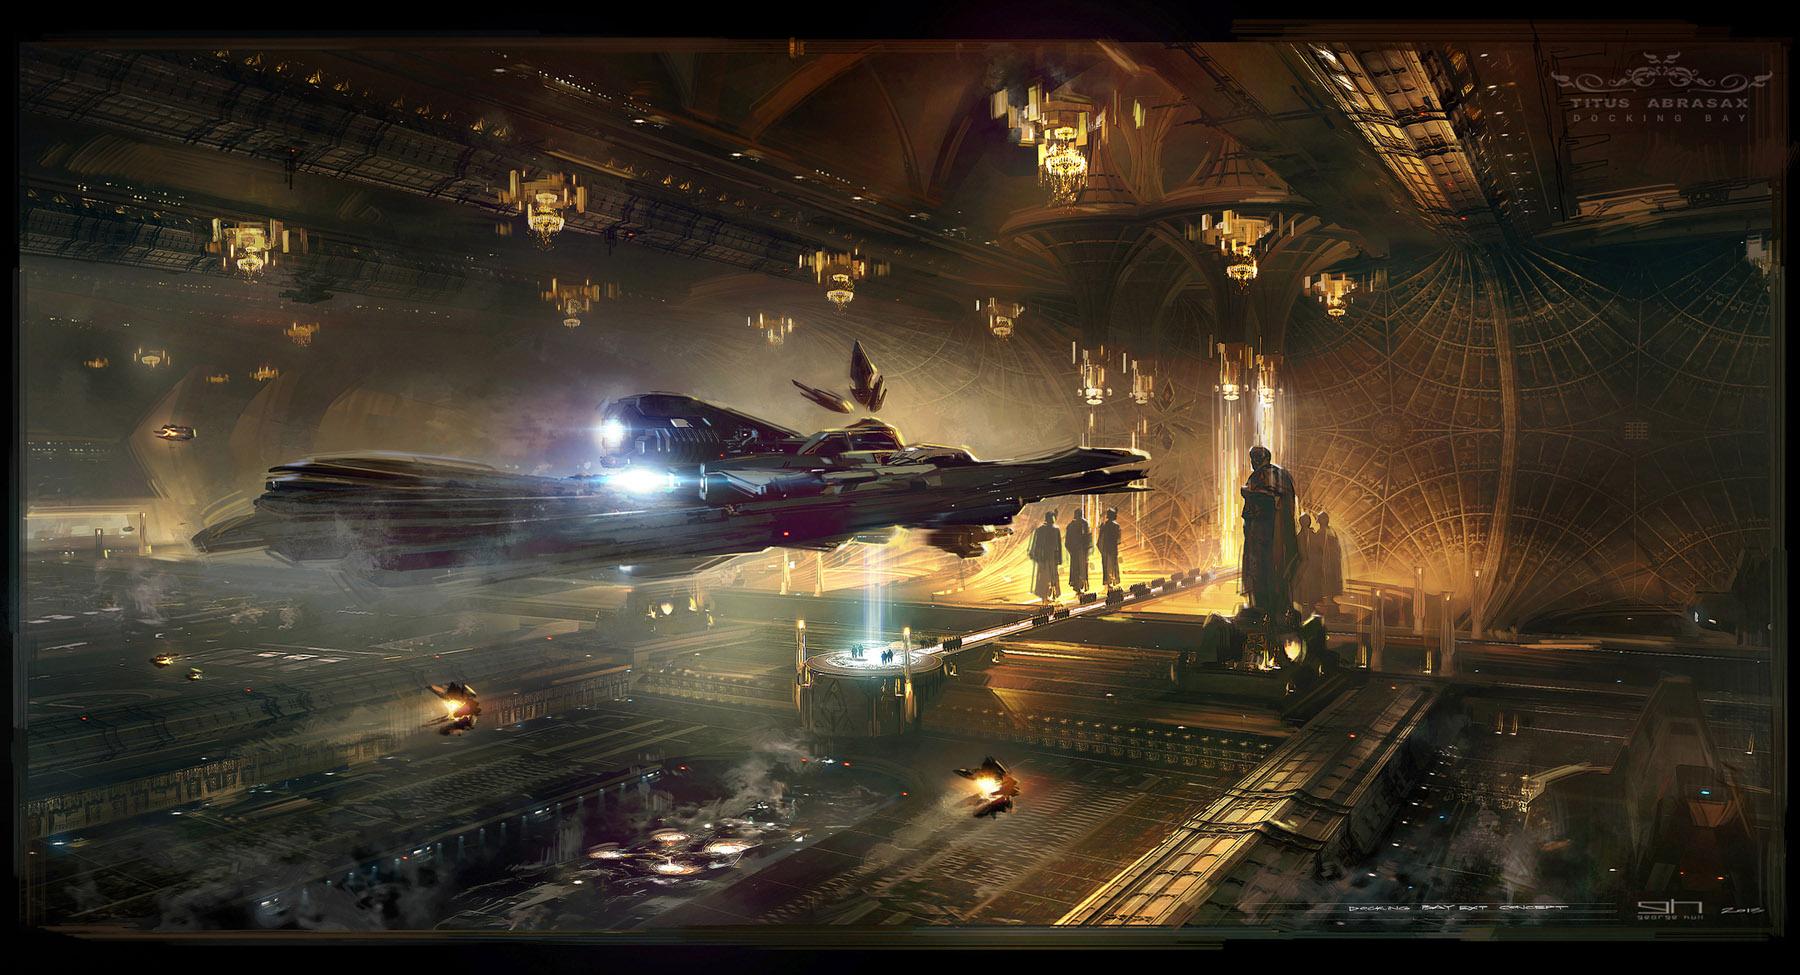 Hunter Wallpaper Hd The Spectacular Science Fiction Concept Art Of Jupiter